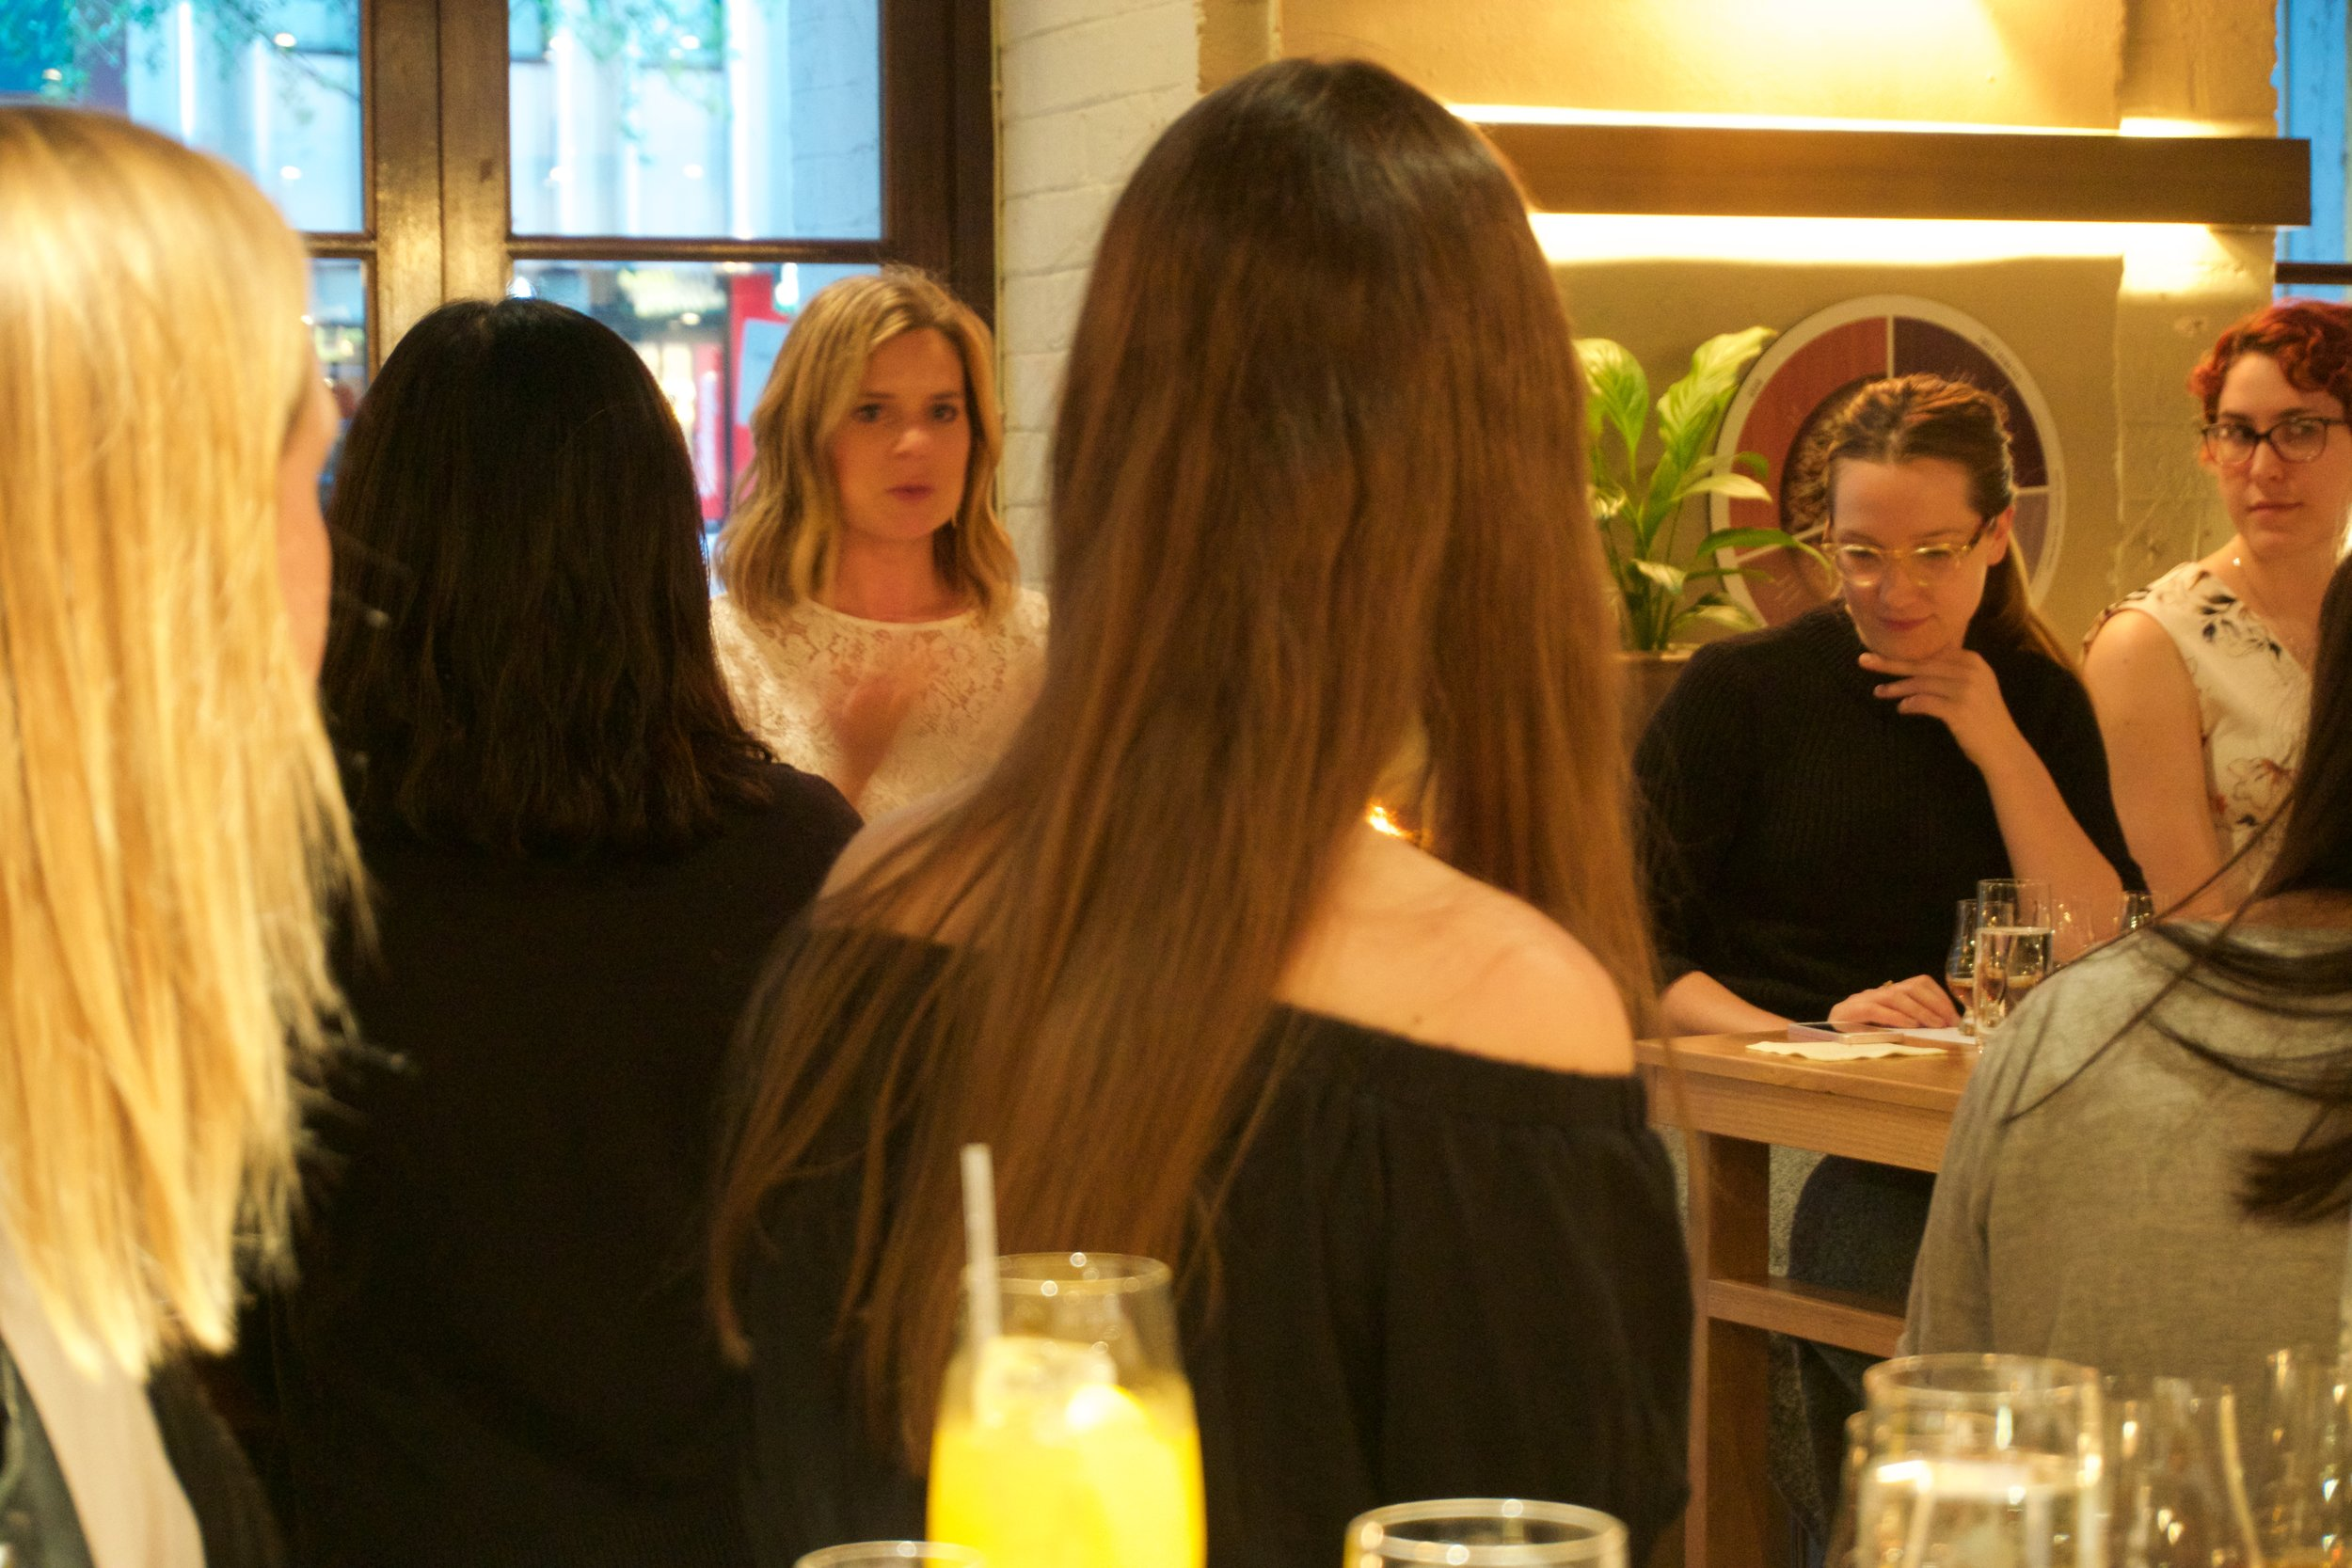 Elizabeth addressing the room at the Women in Whiskey tasting at Tankstream Bar in November 2017